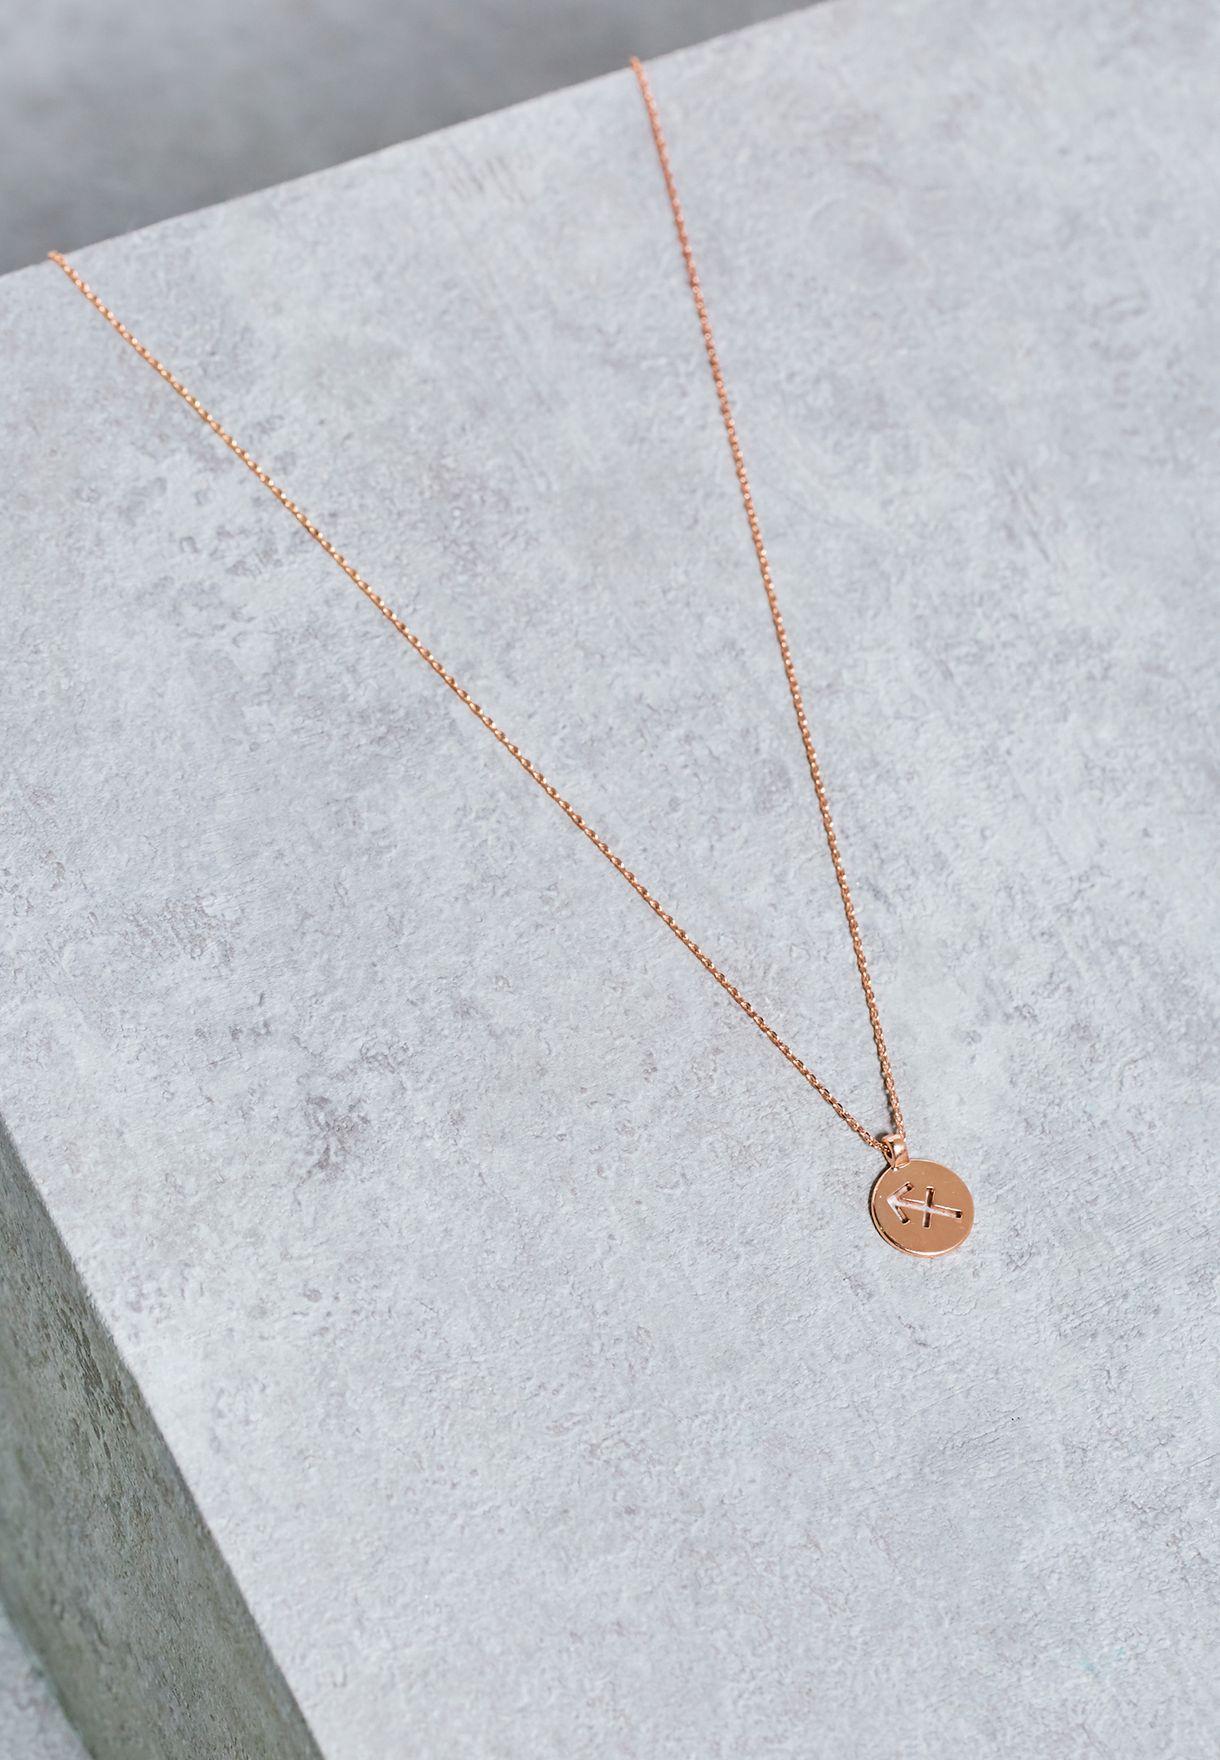 86c375ceae7 Shop Pieces gold Halle Sagittarius Necklace for Women in Qatar ...